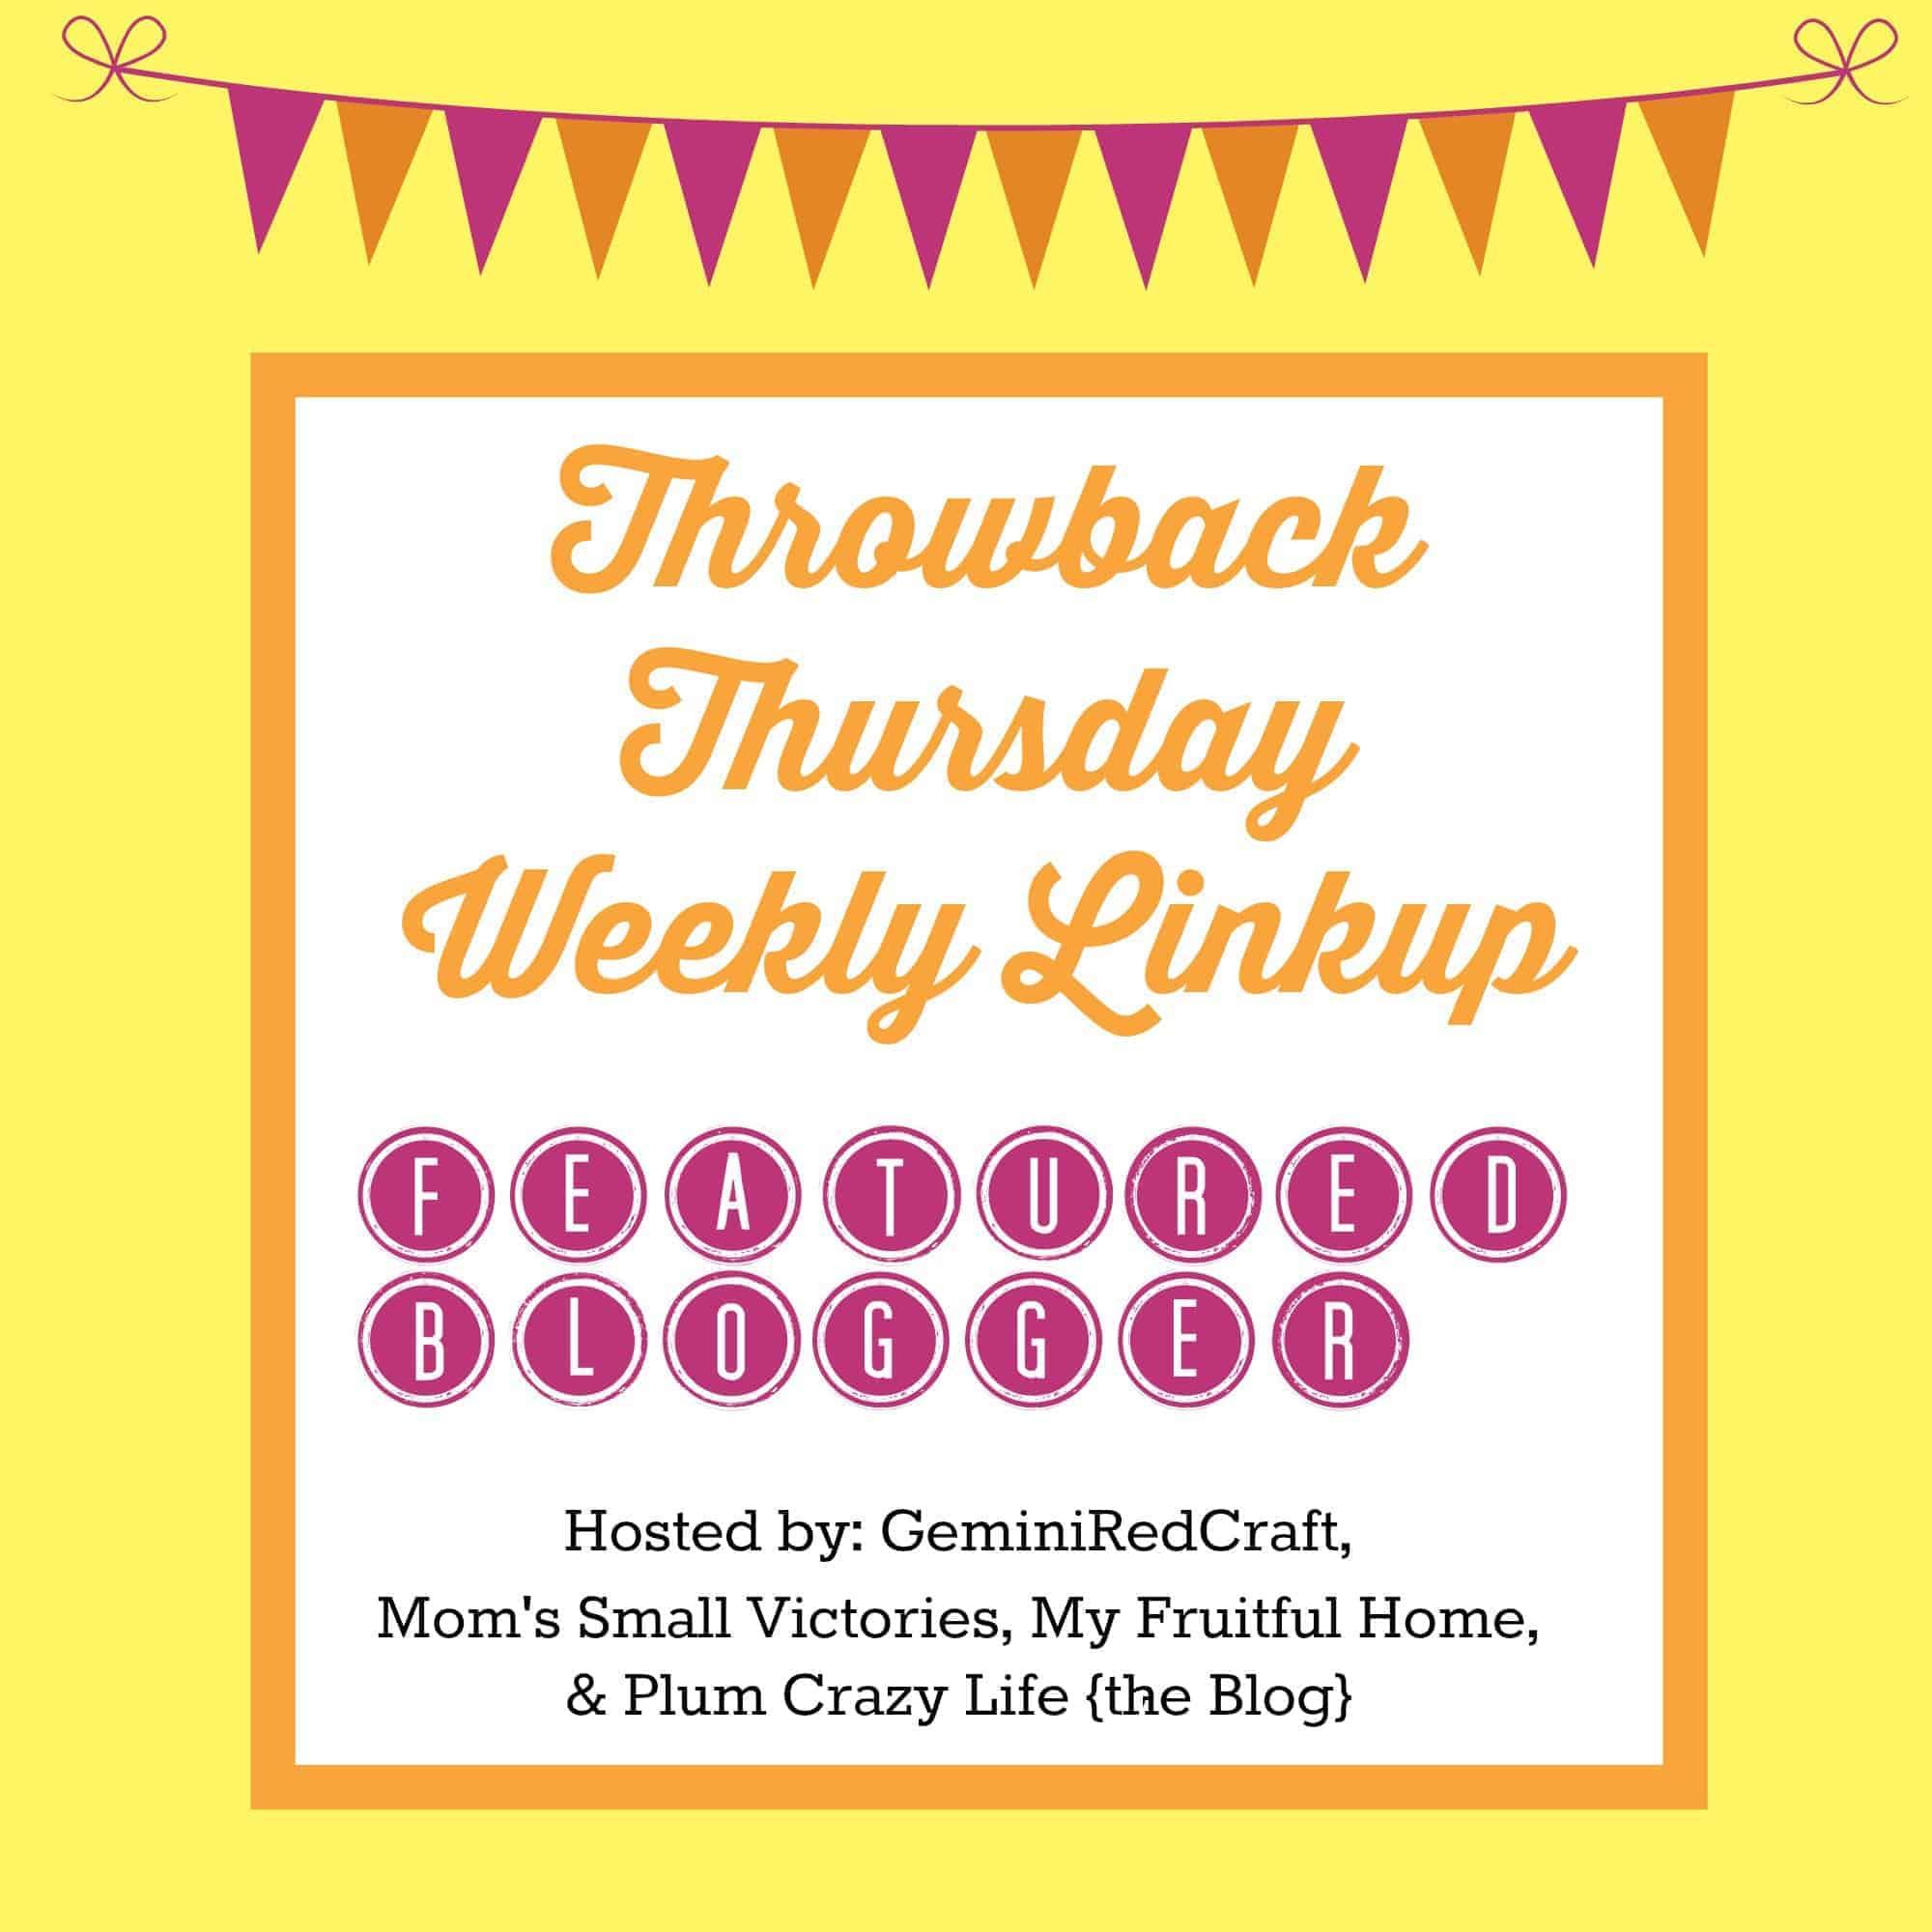 Ophelia S Adornments Blog Plum Crazy: Throwback Thursday Linkup {31}